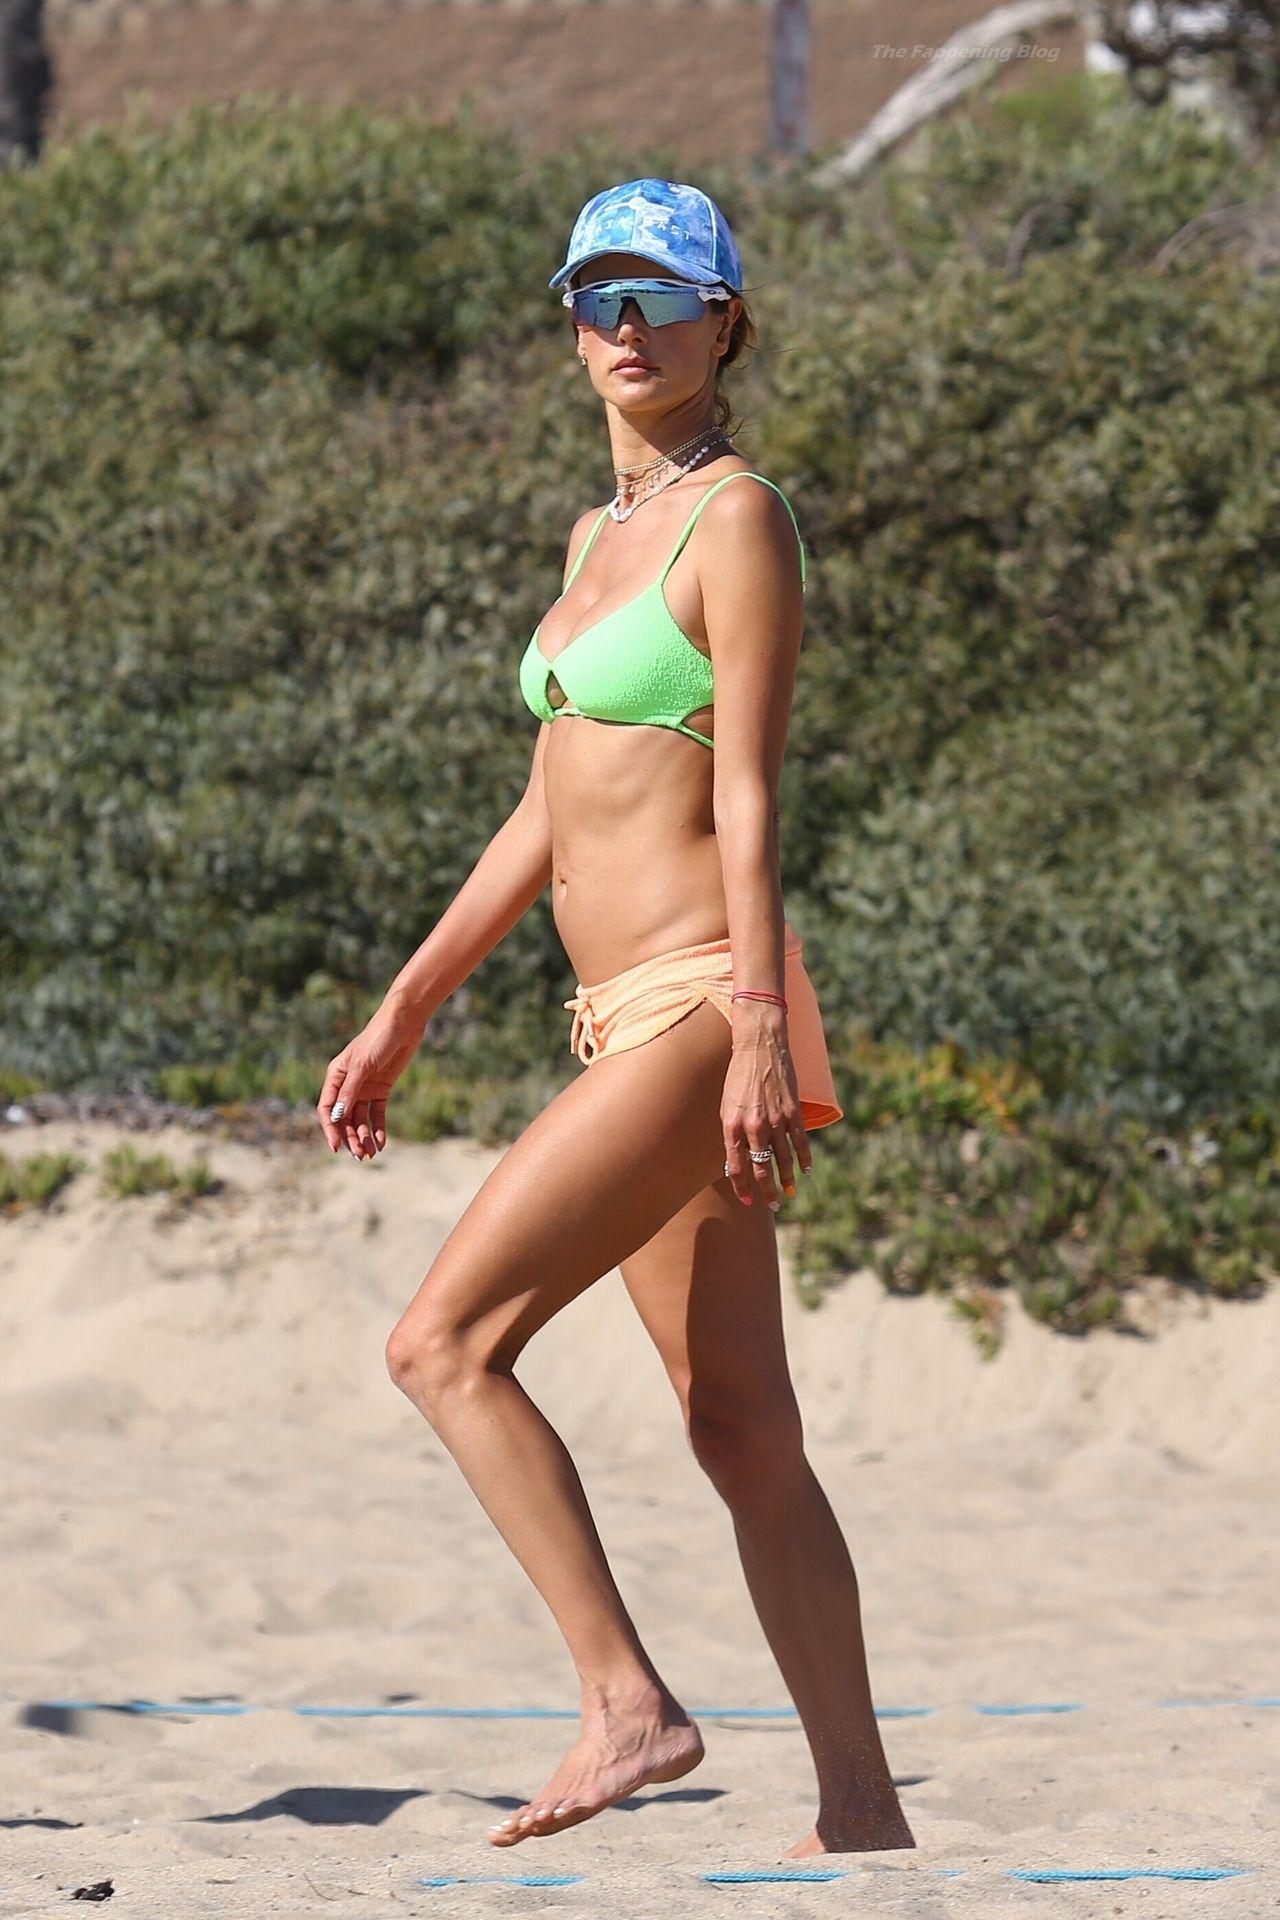 Alessandra-Ambrosio-Sexy-The-Fappening-Blog-431.jpg